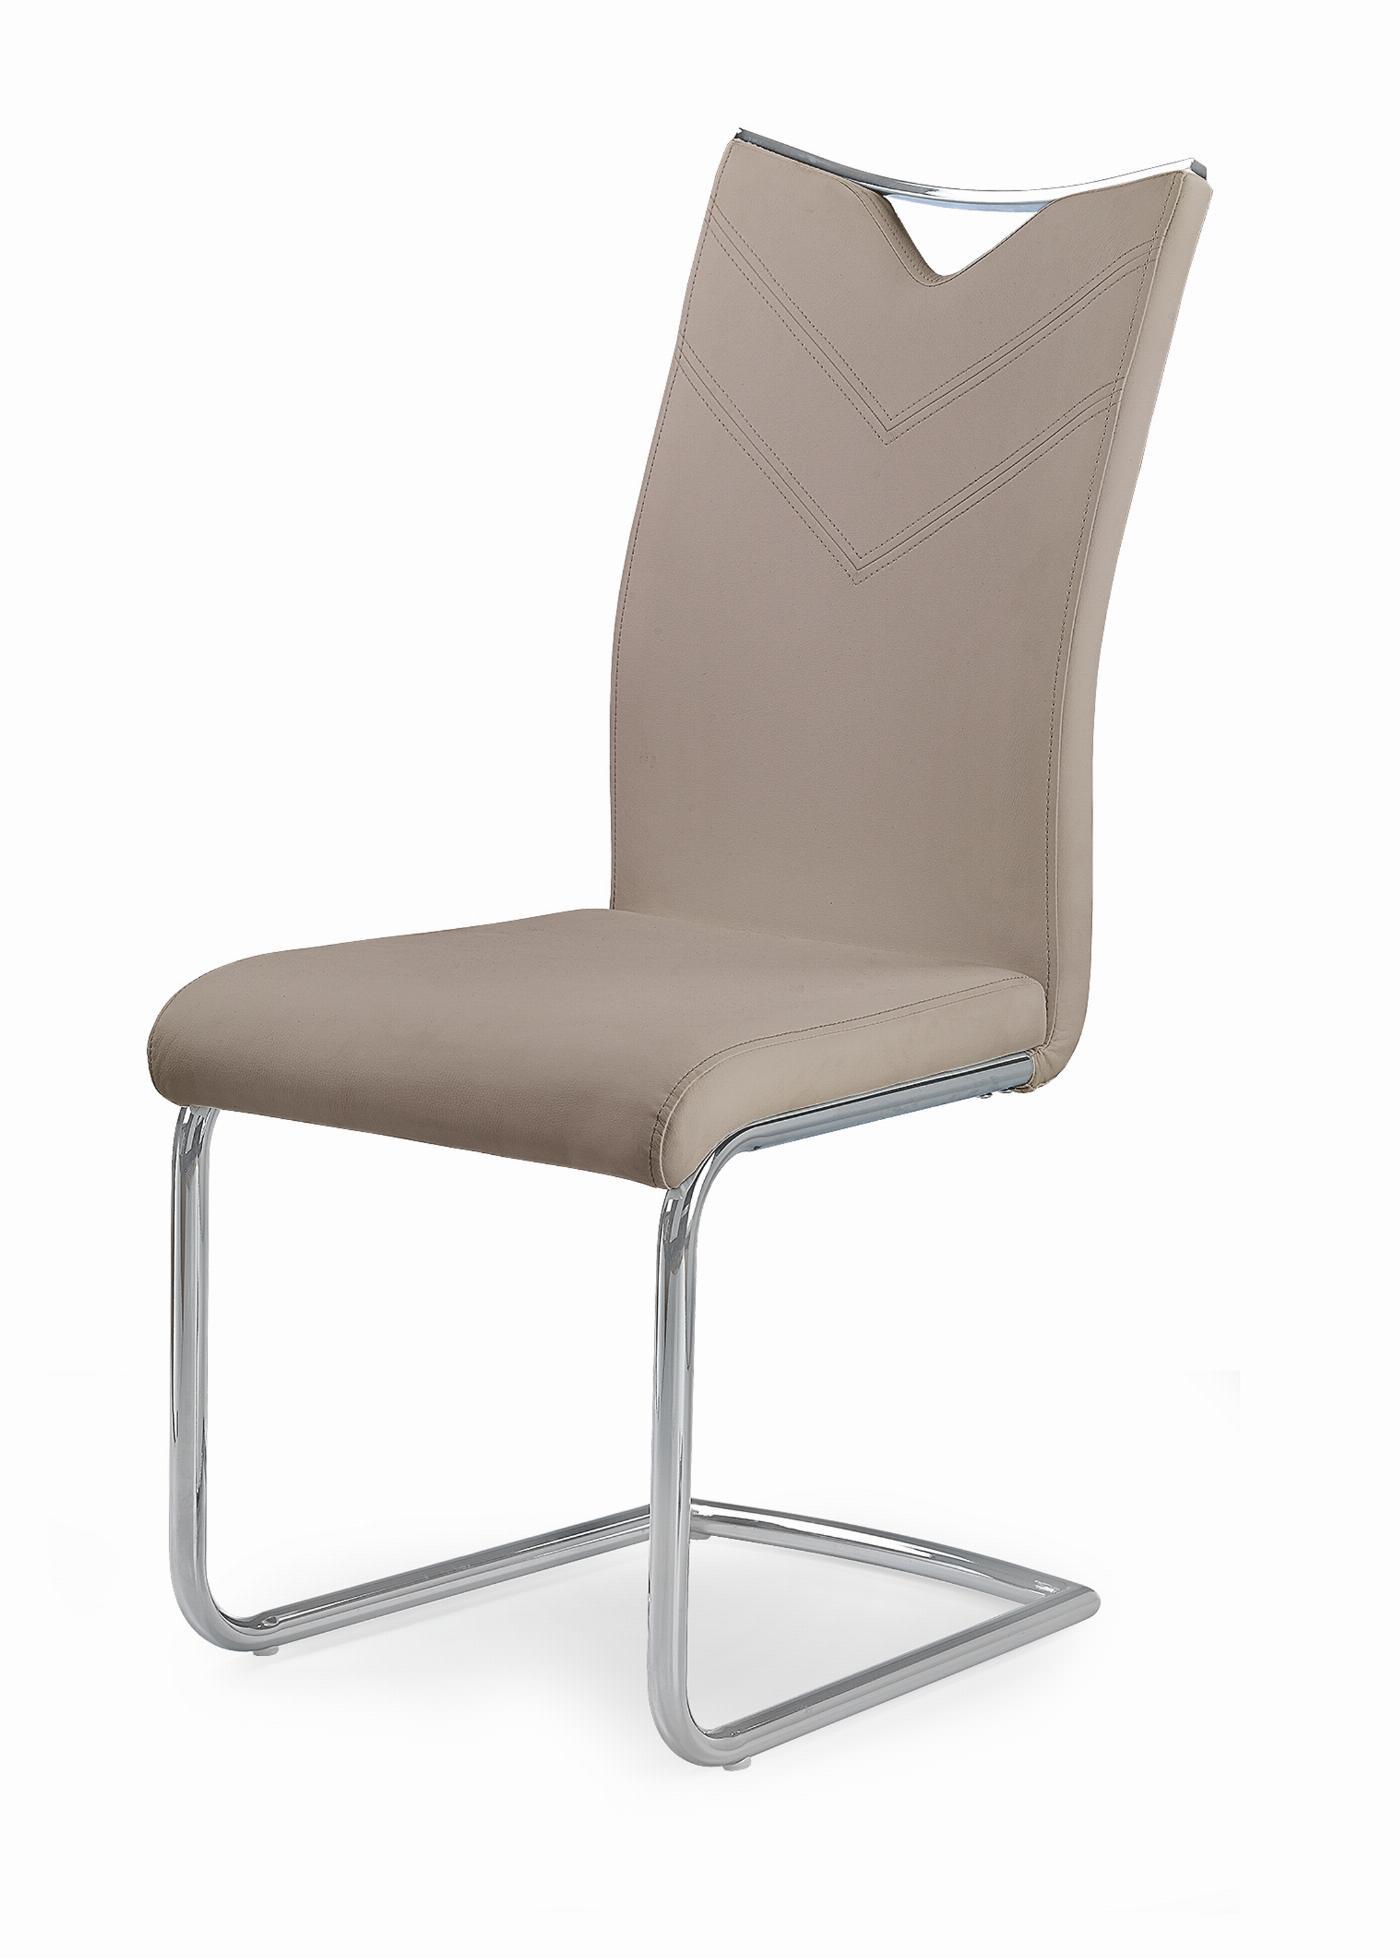 K224 krzesło cappuccino (1p=4szt)